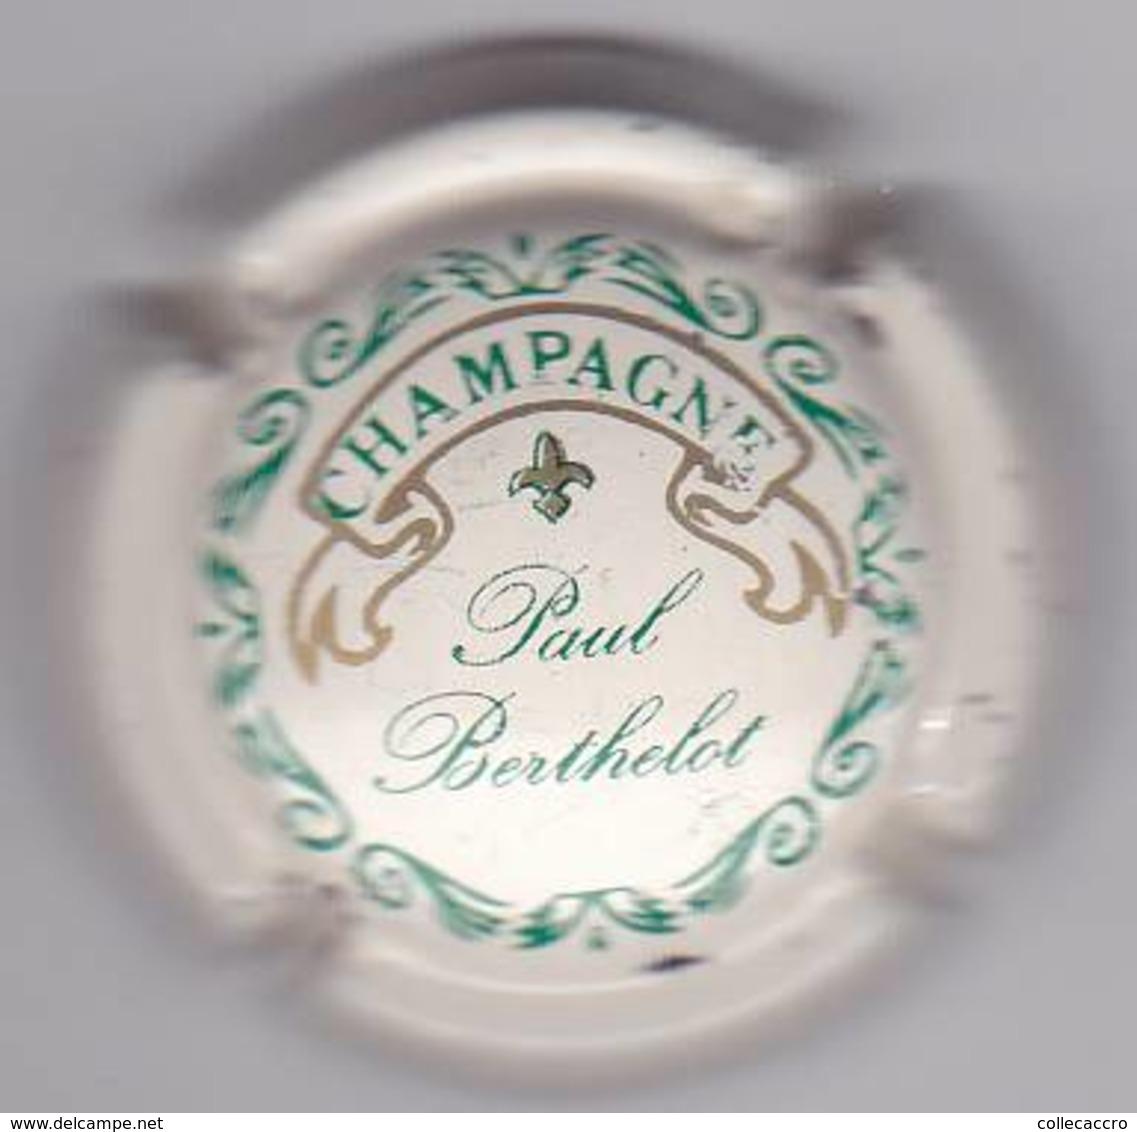 BERTHELOT N°4 - Champagne